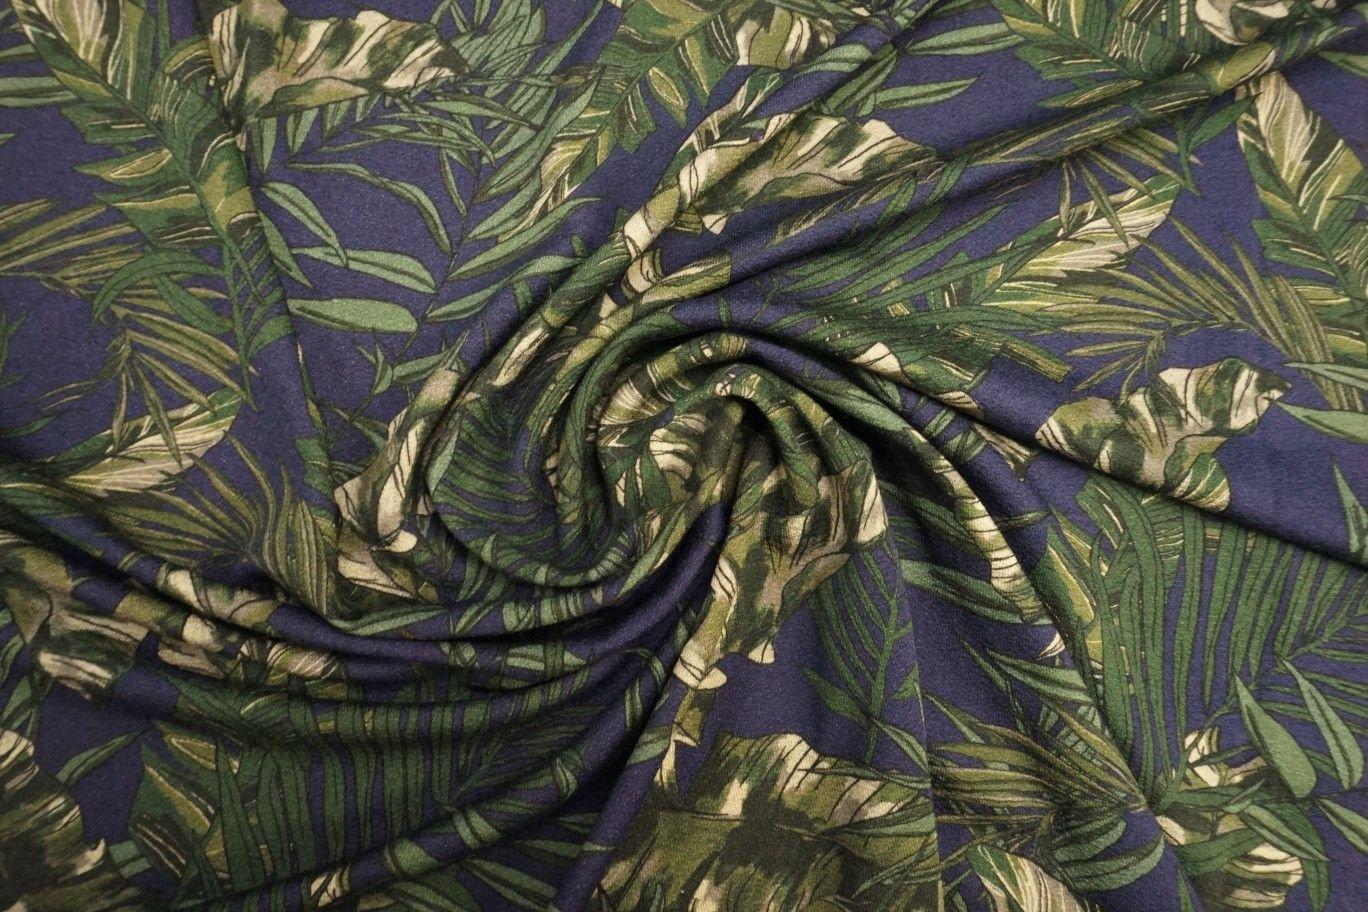 Lady McElroy Viscose Crepe Jersey - Saniago Leaf